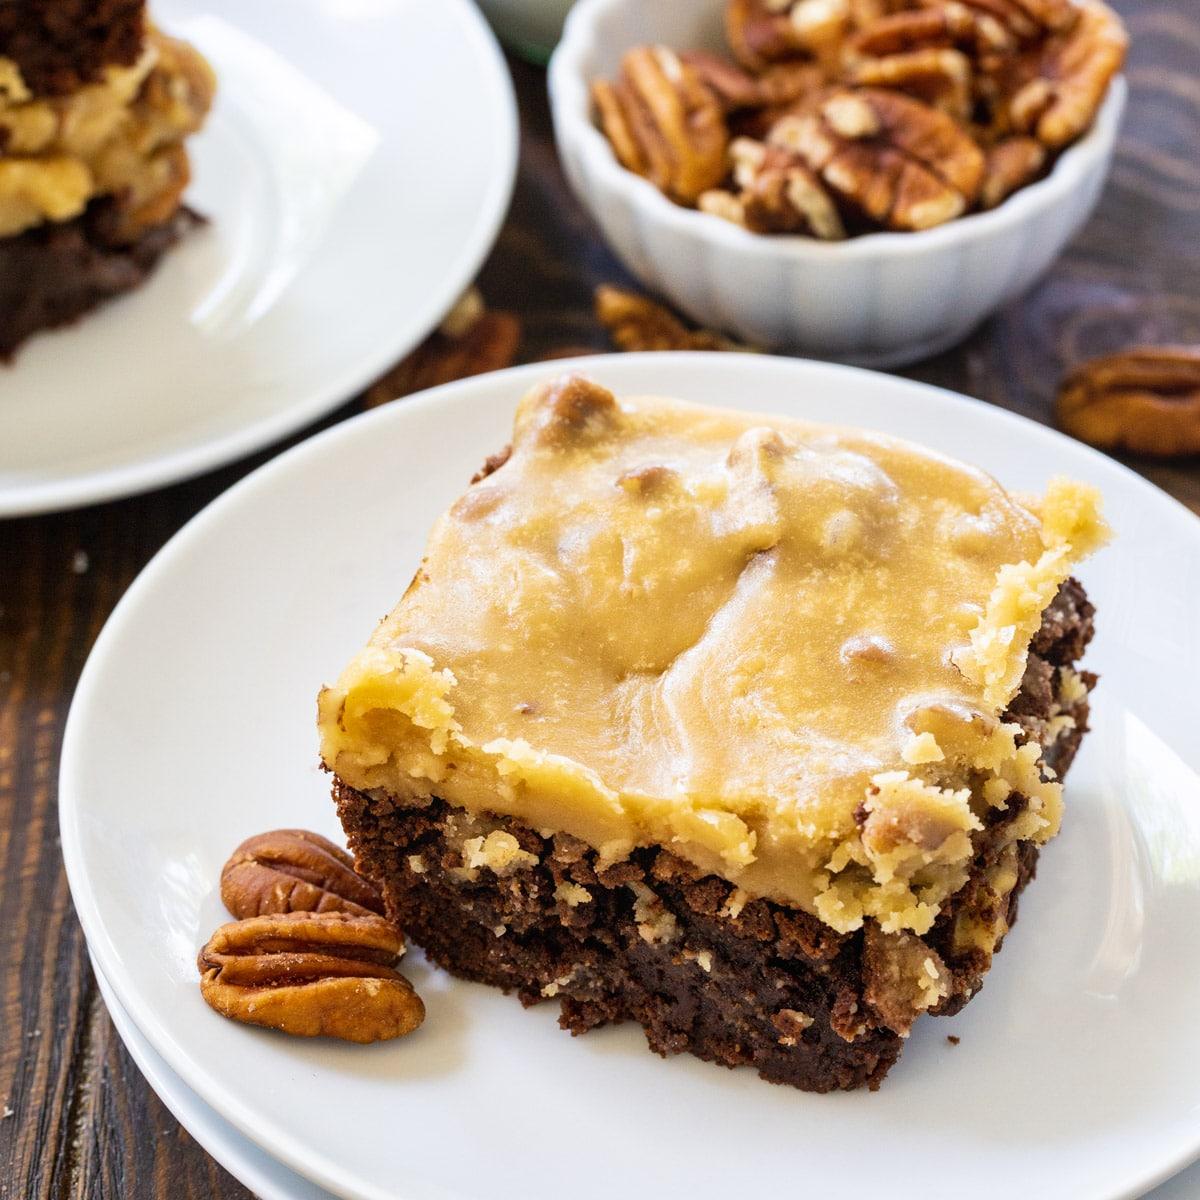 Praline Brownie on a plate.